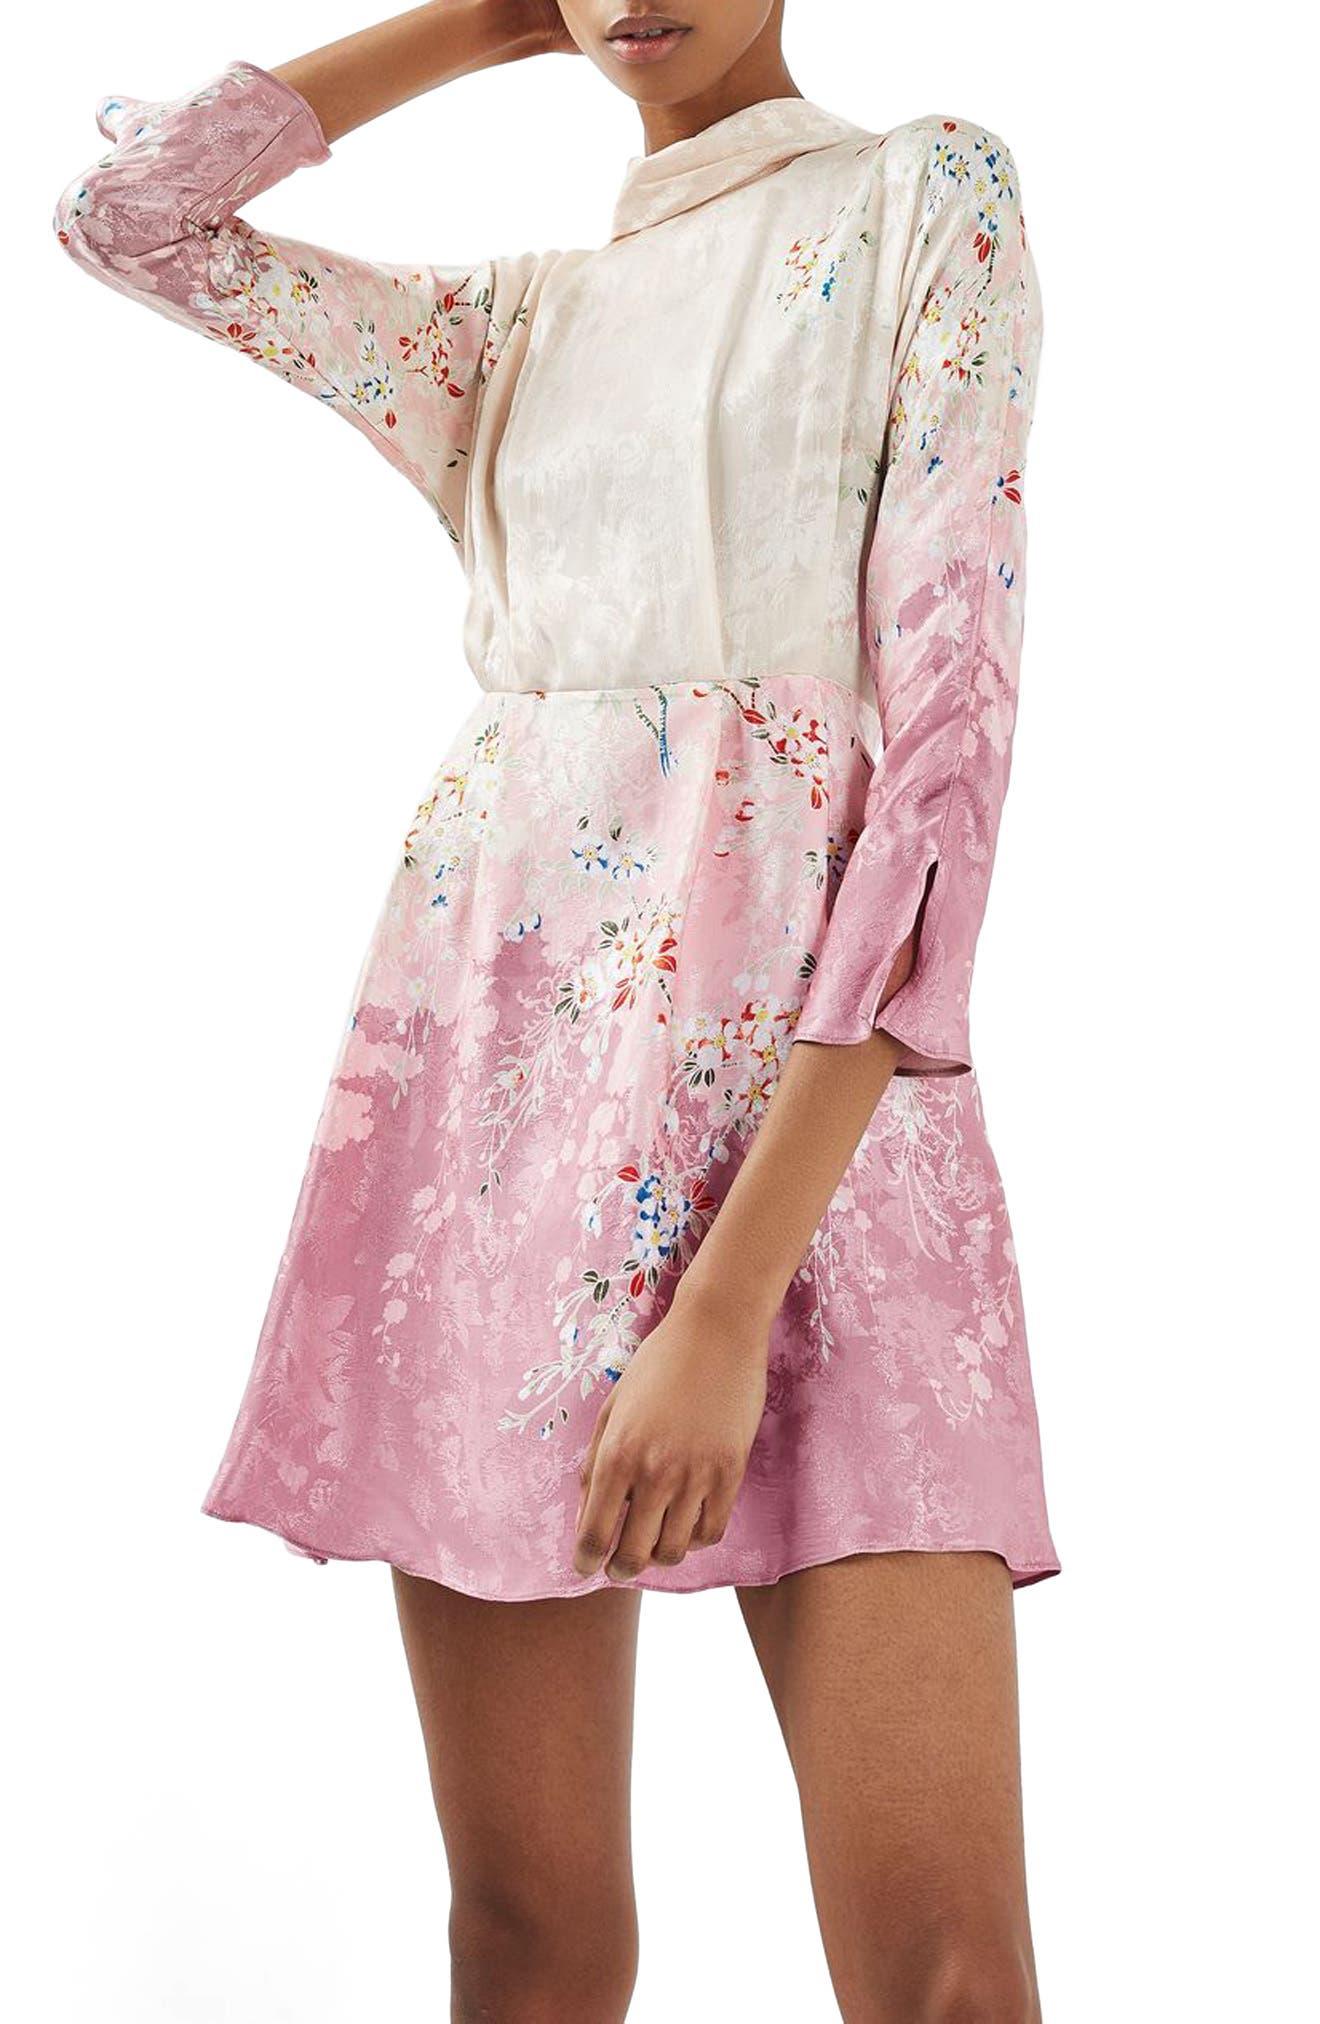 Jacquard Floral Print Dress,                             Main thumbnail 1, color,                             680